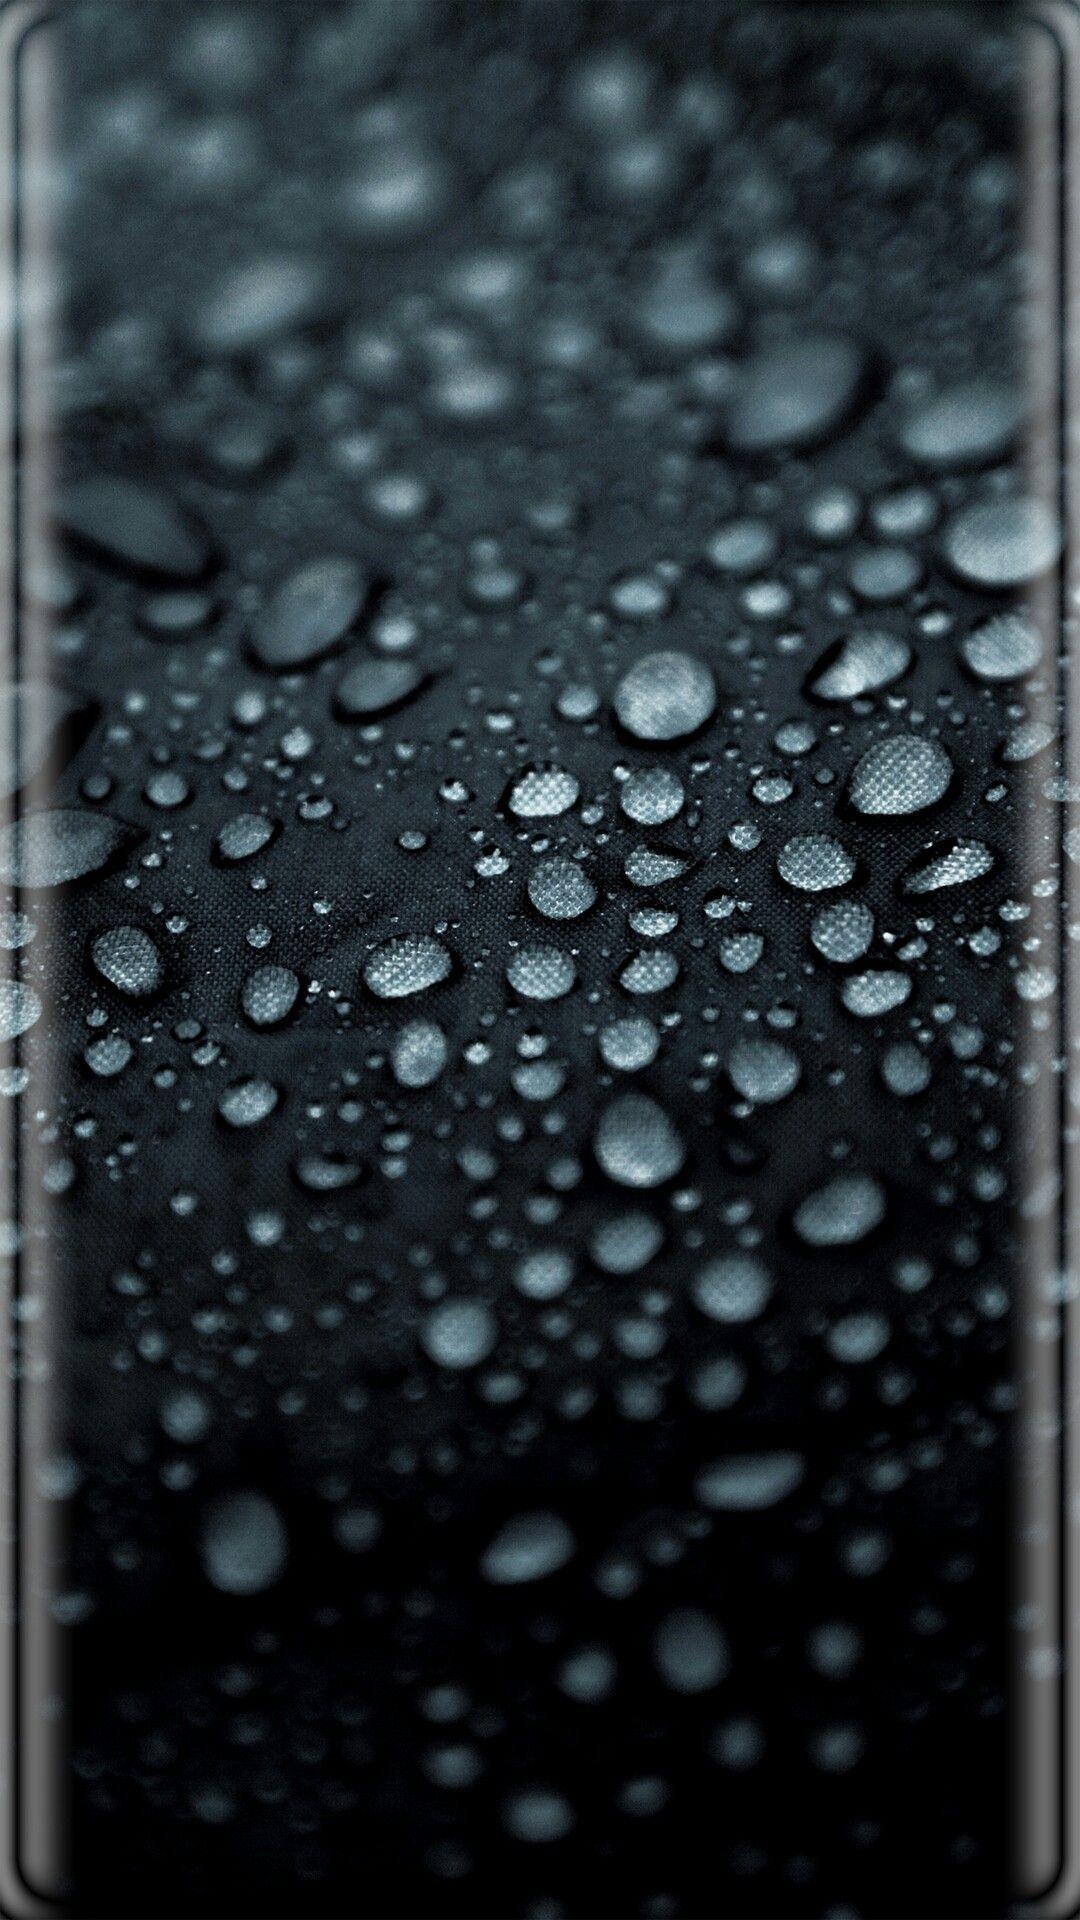 Pin By Moneeb Badran On Wallpapers Black Wallpaper Coheed